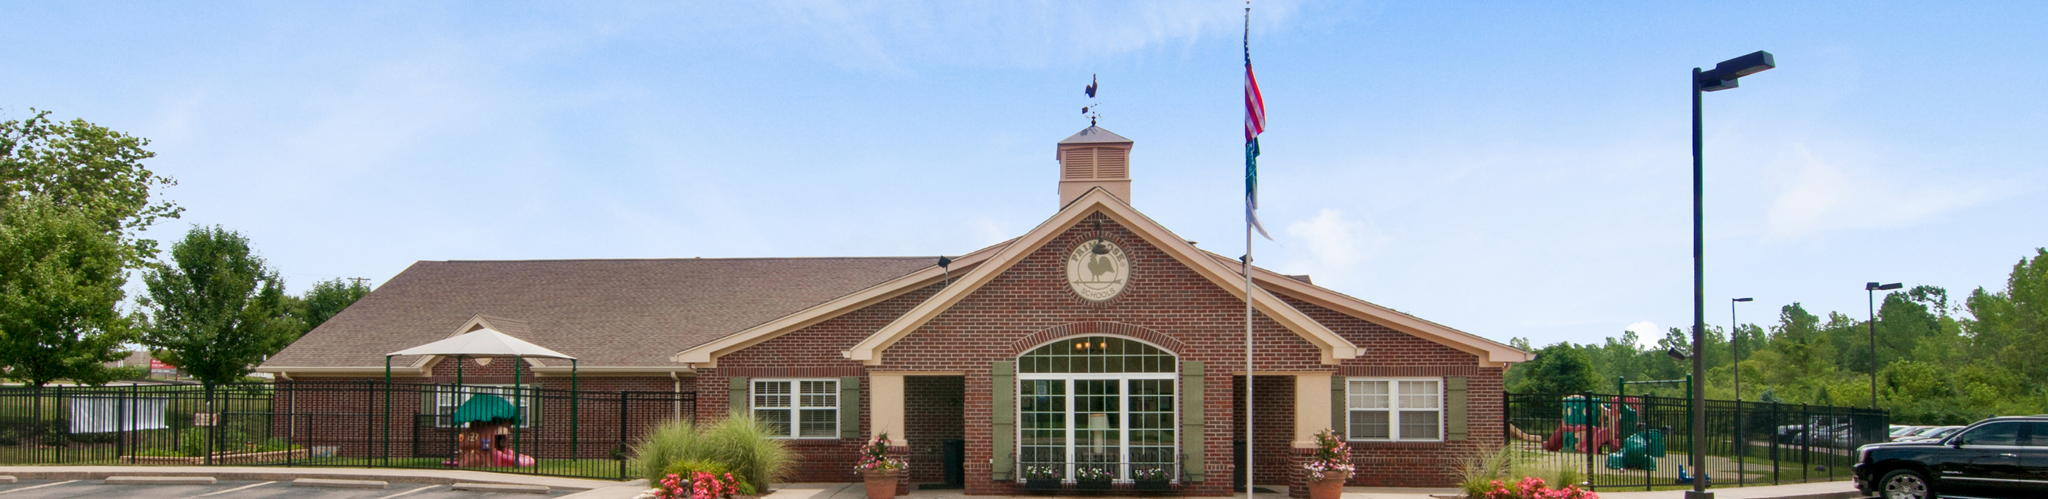 Exterior of a Primrose School of Centerville